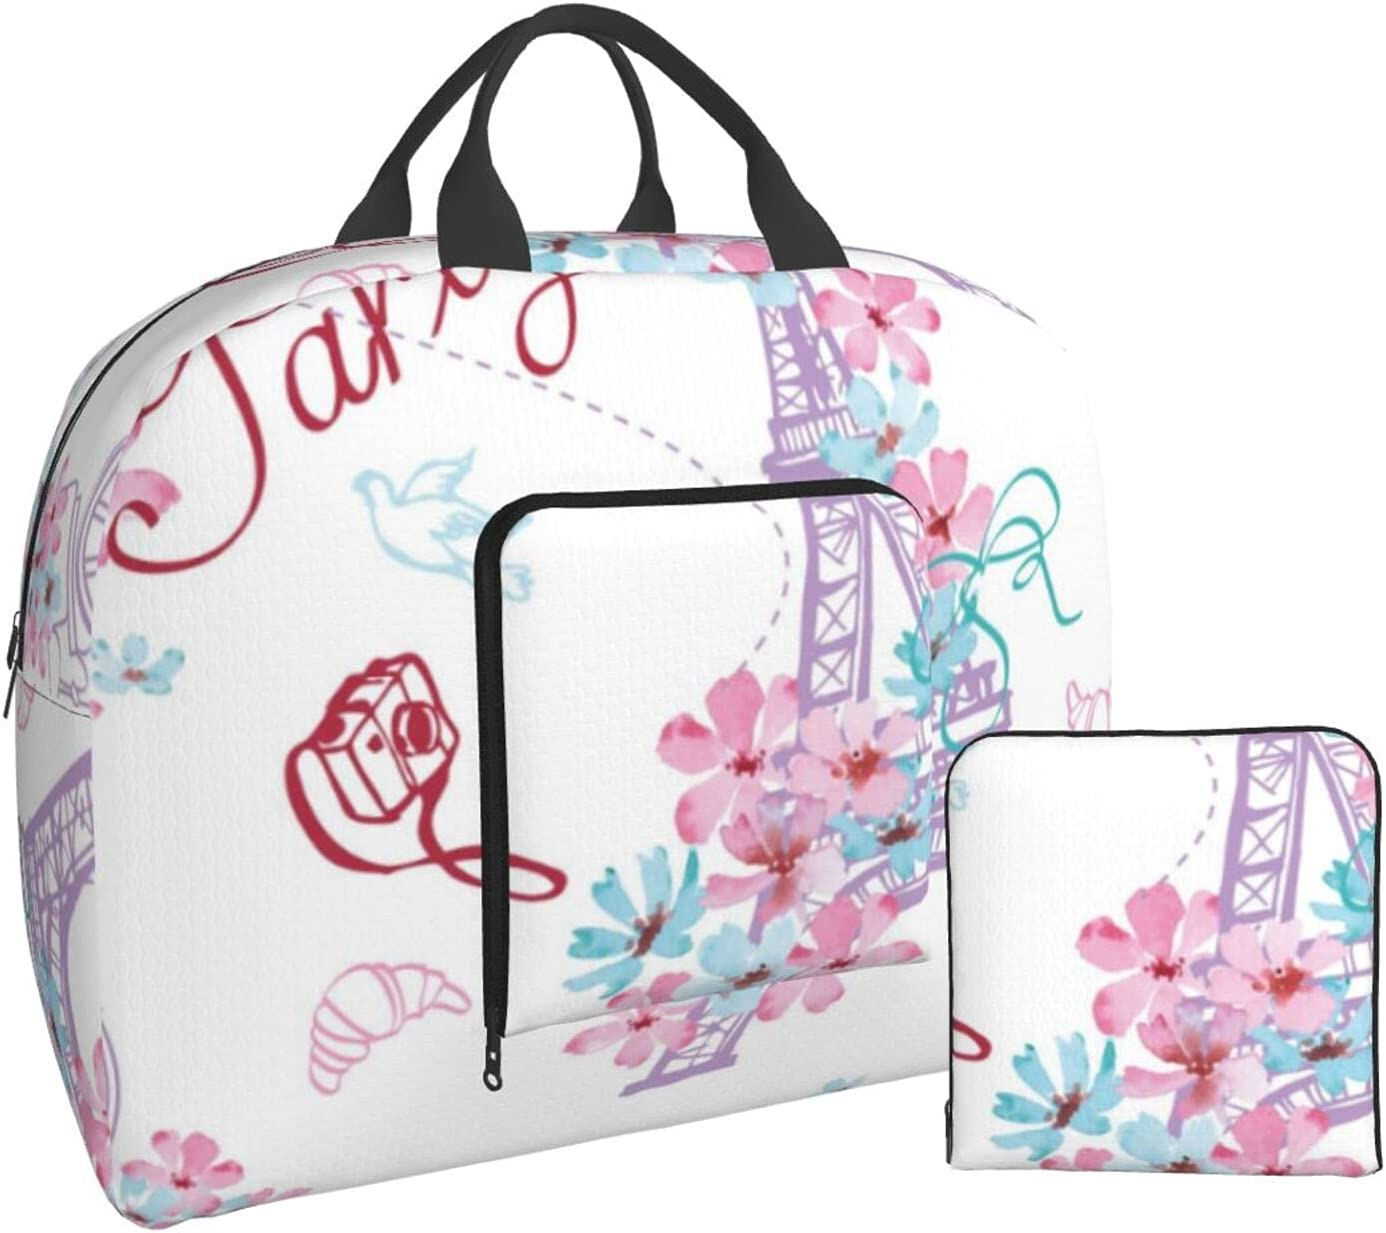 Foldable Ranking TOP4 Travel Duffel Bag Romantic Folding Paris In Baltimore Mall Duff